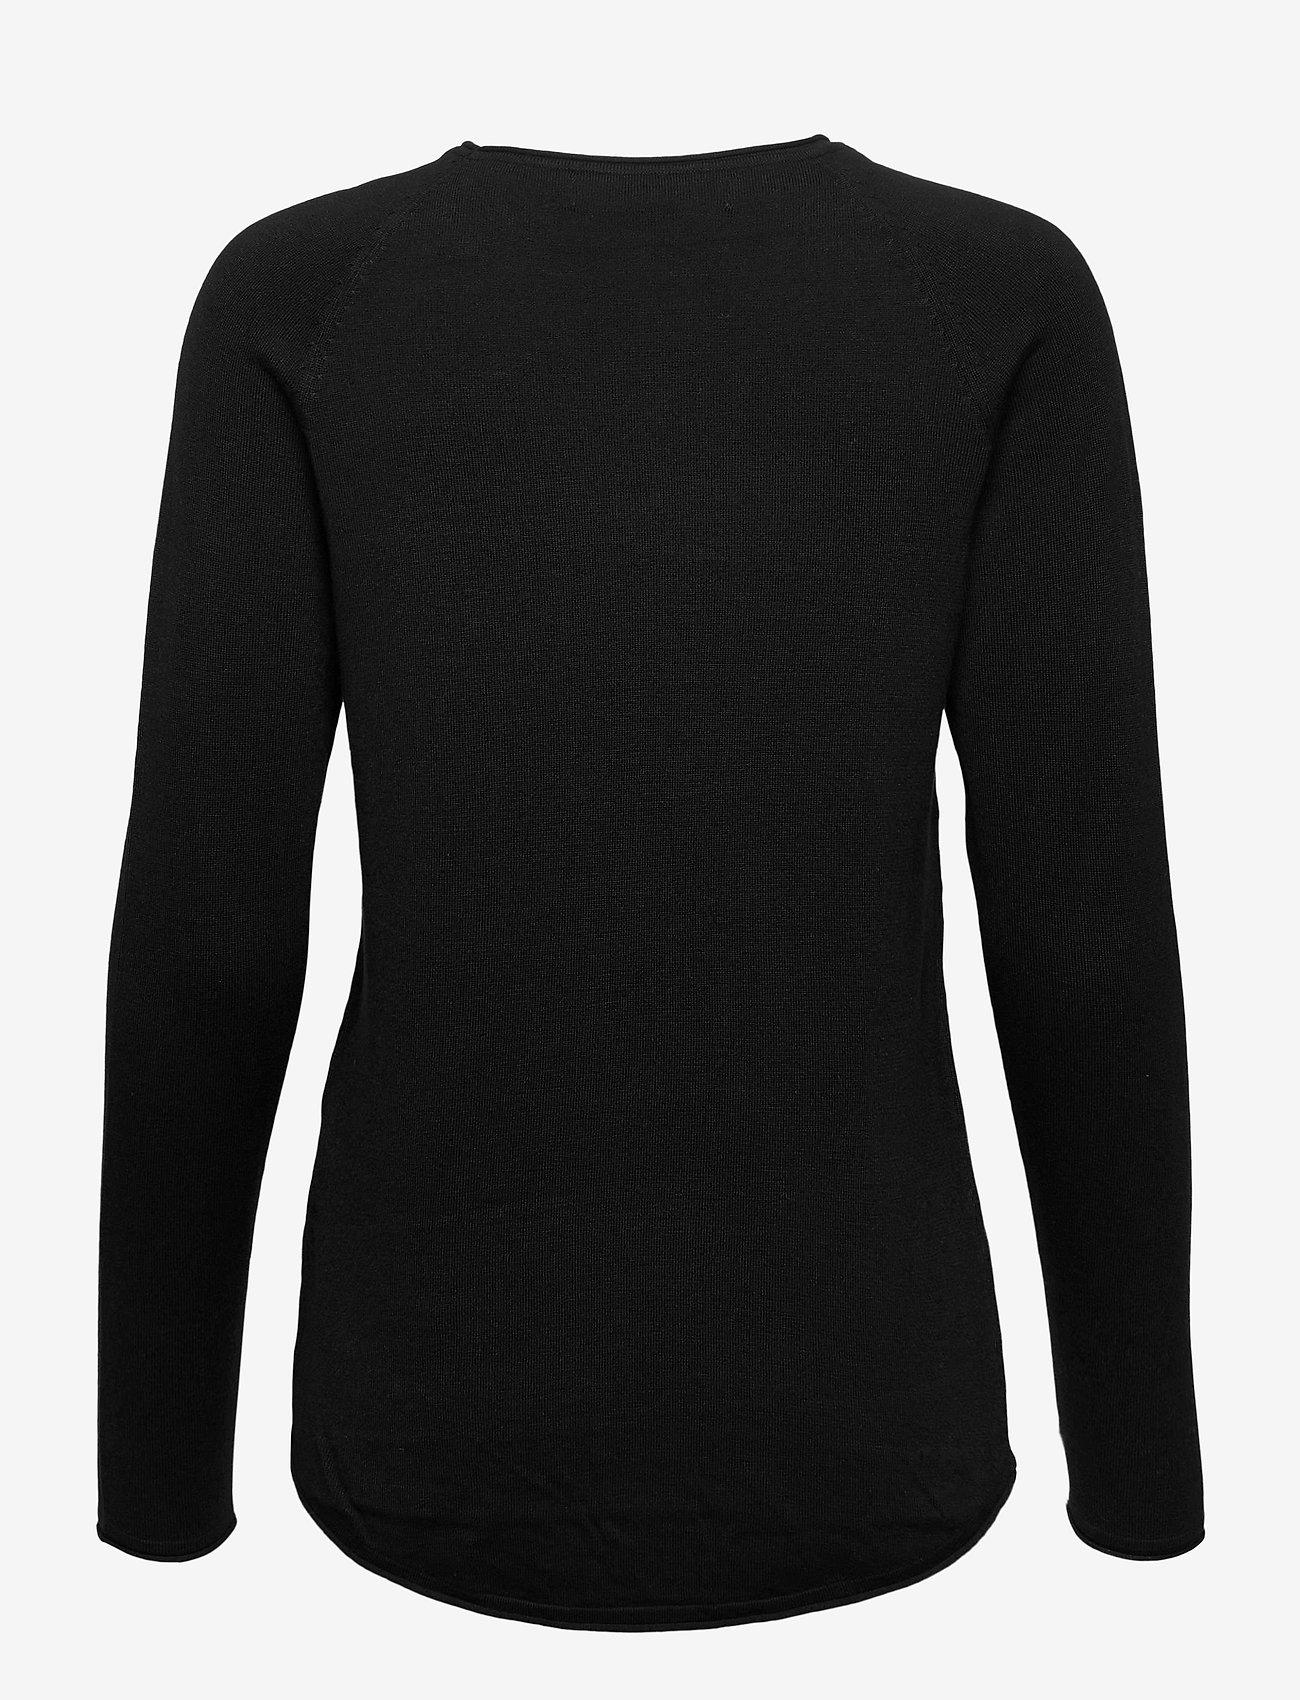 Vero Moda - VMNELLIE GLORY LS LONG BLOUSE - tröjor - black - 1